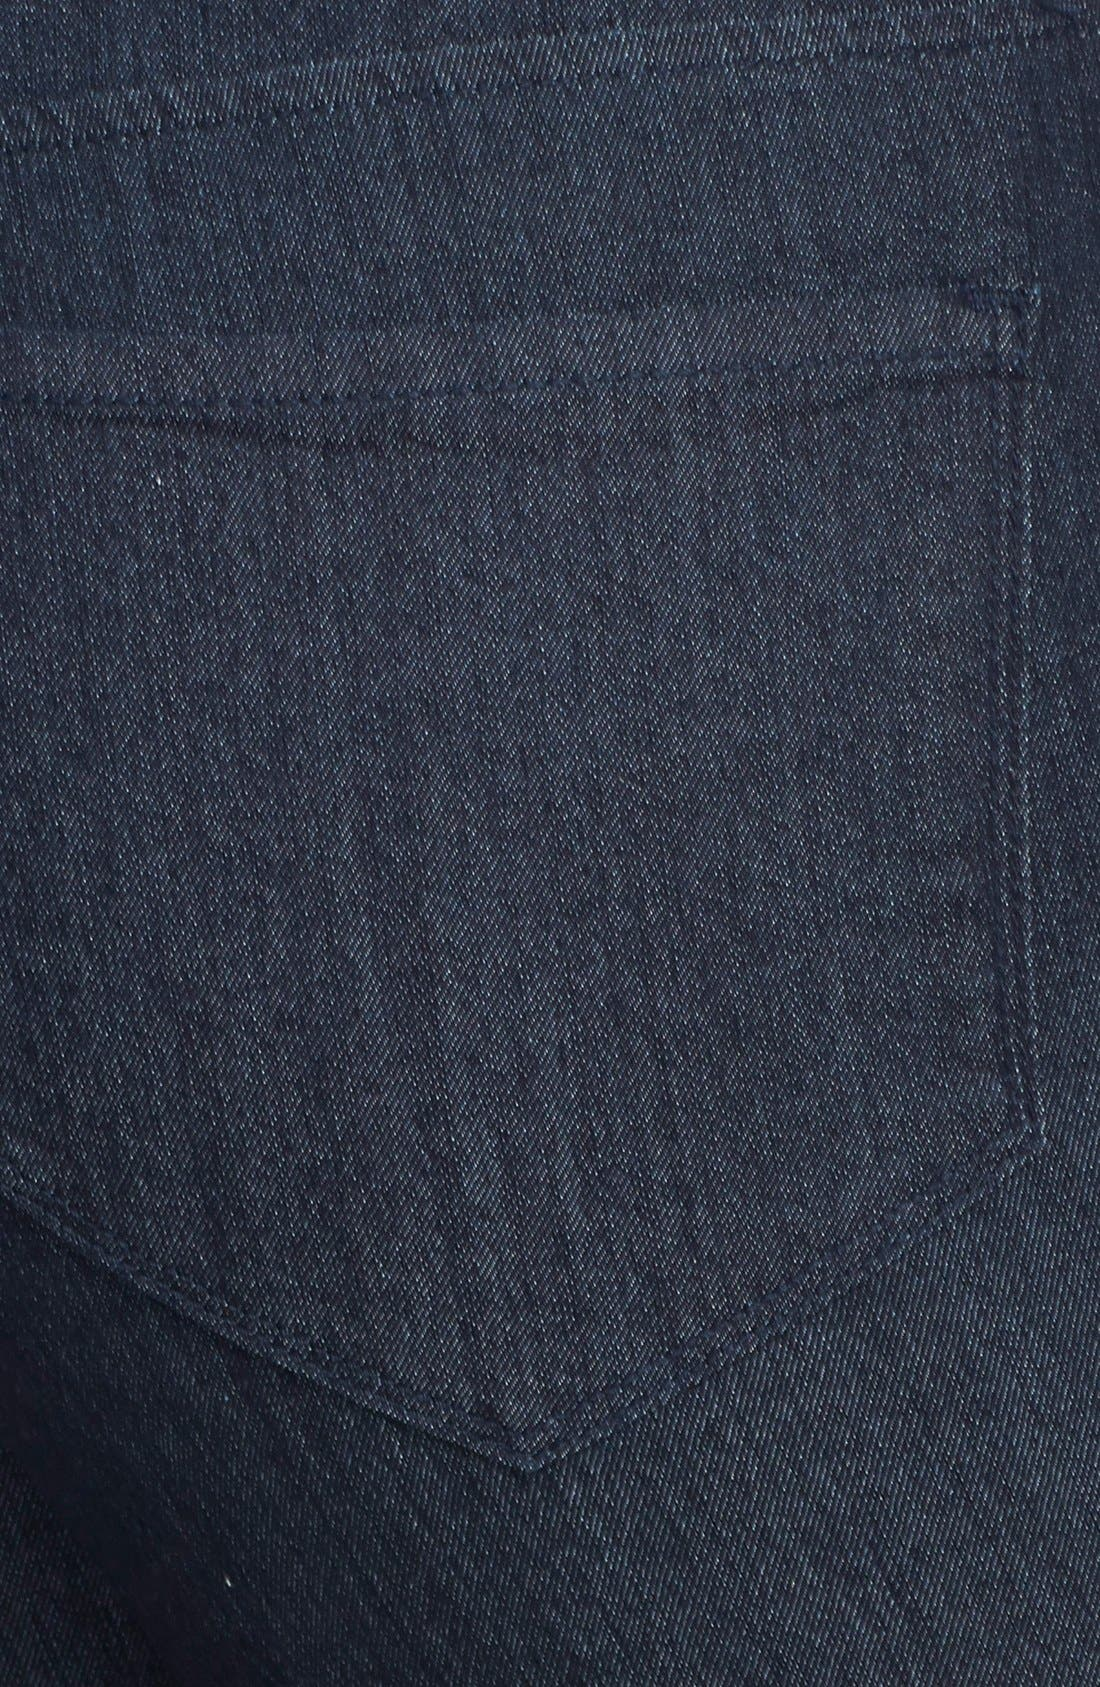 Alternate Image 3  - NYDJ 'Millie' Stretch Ankle Jeans (Dark Enzyme) (Plus Size)